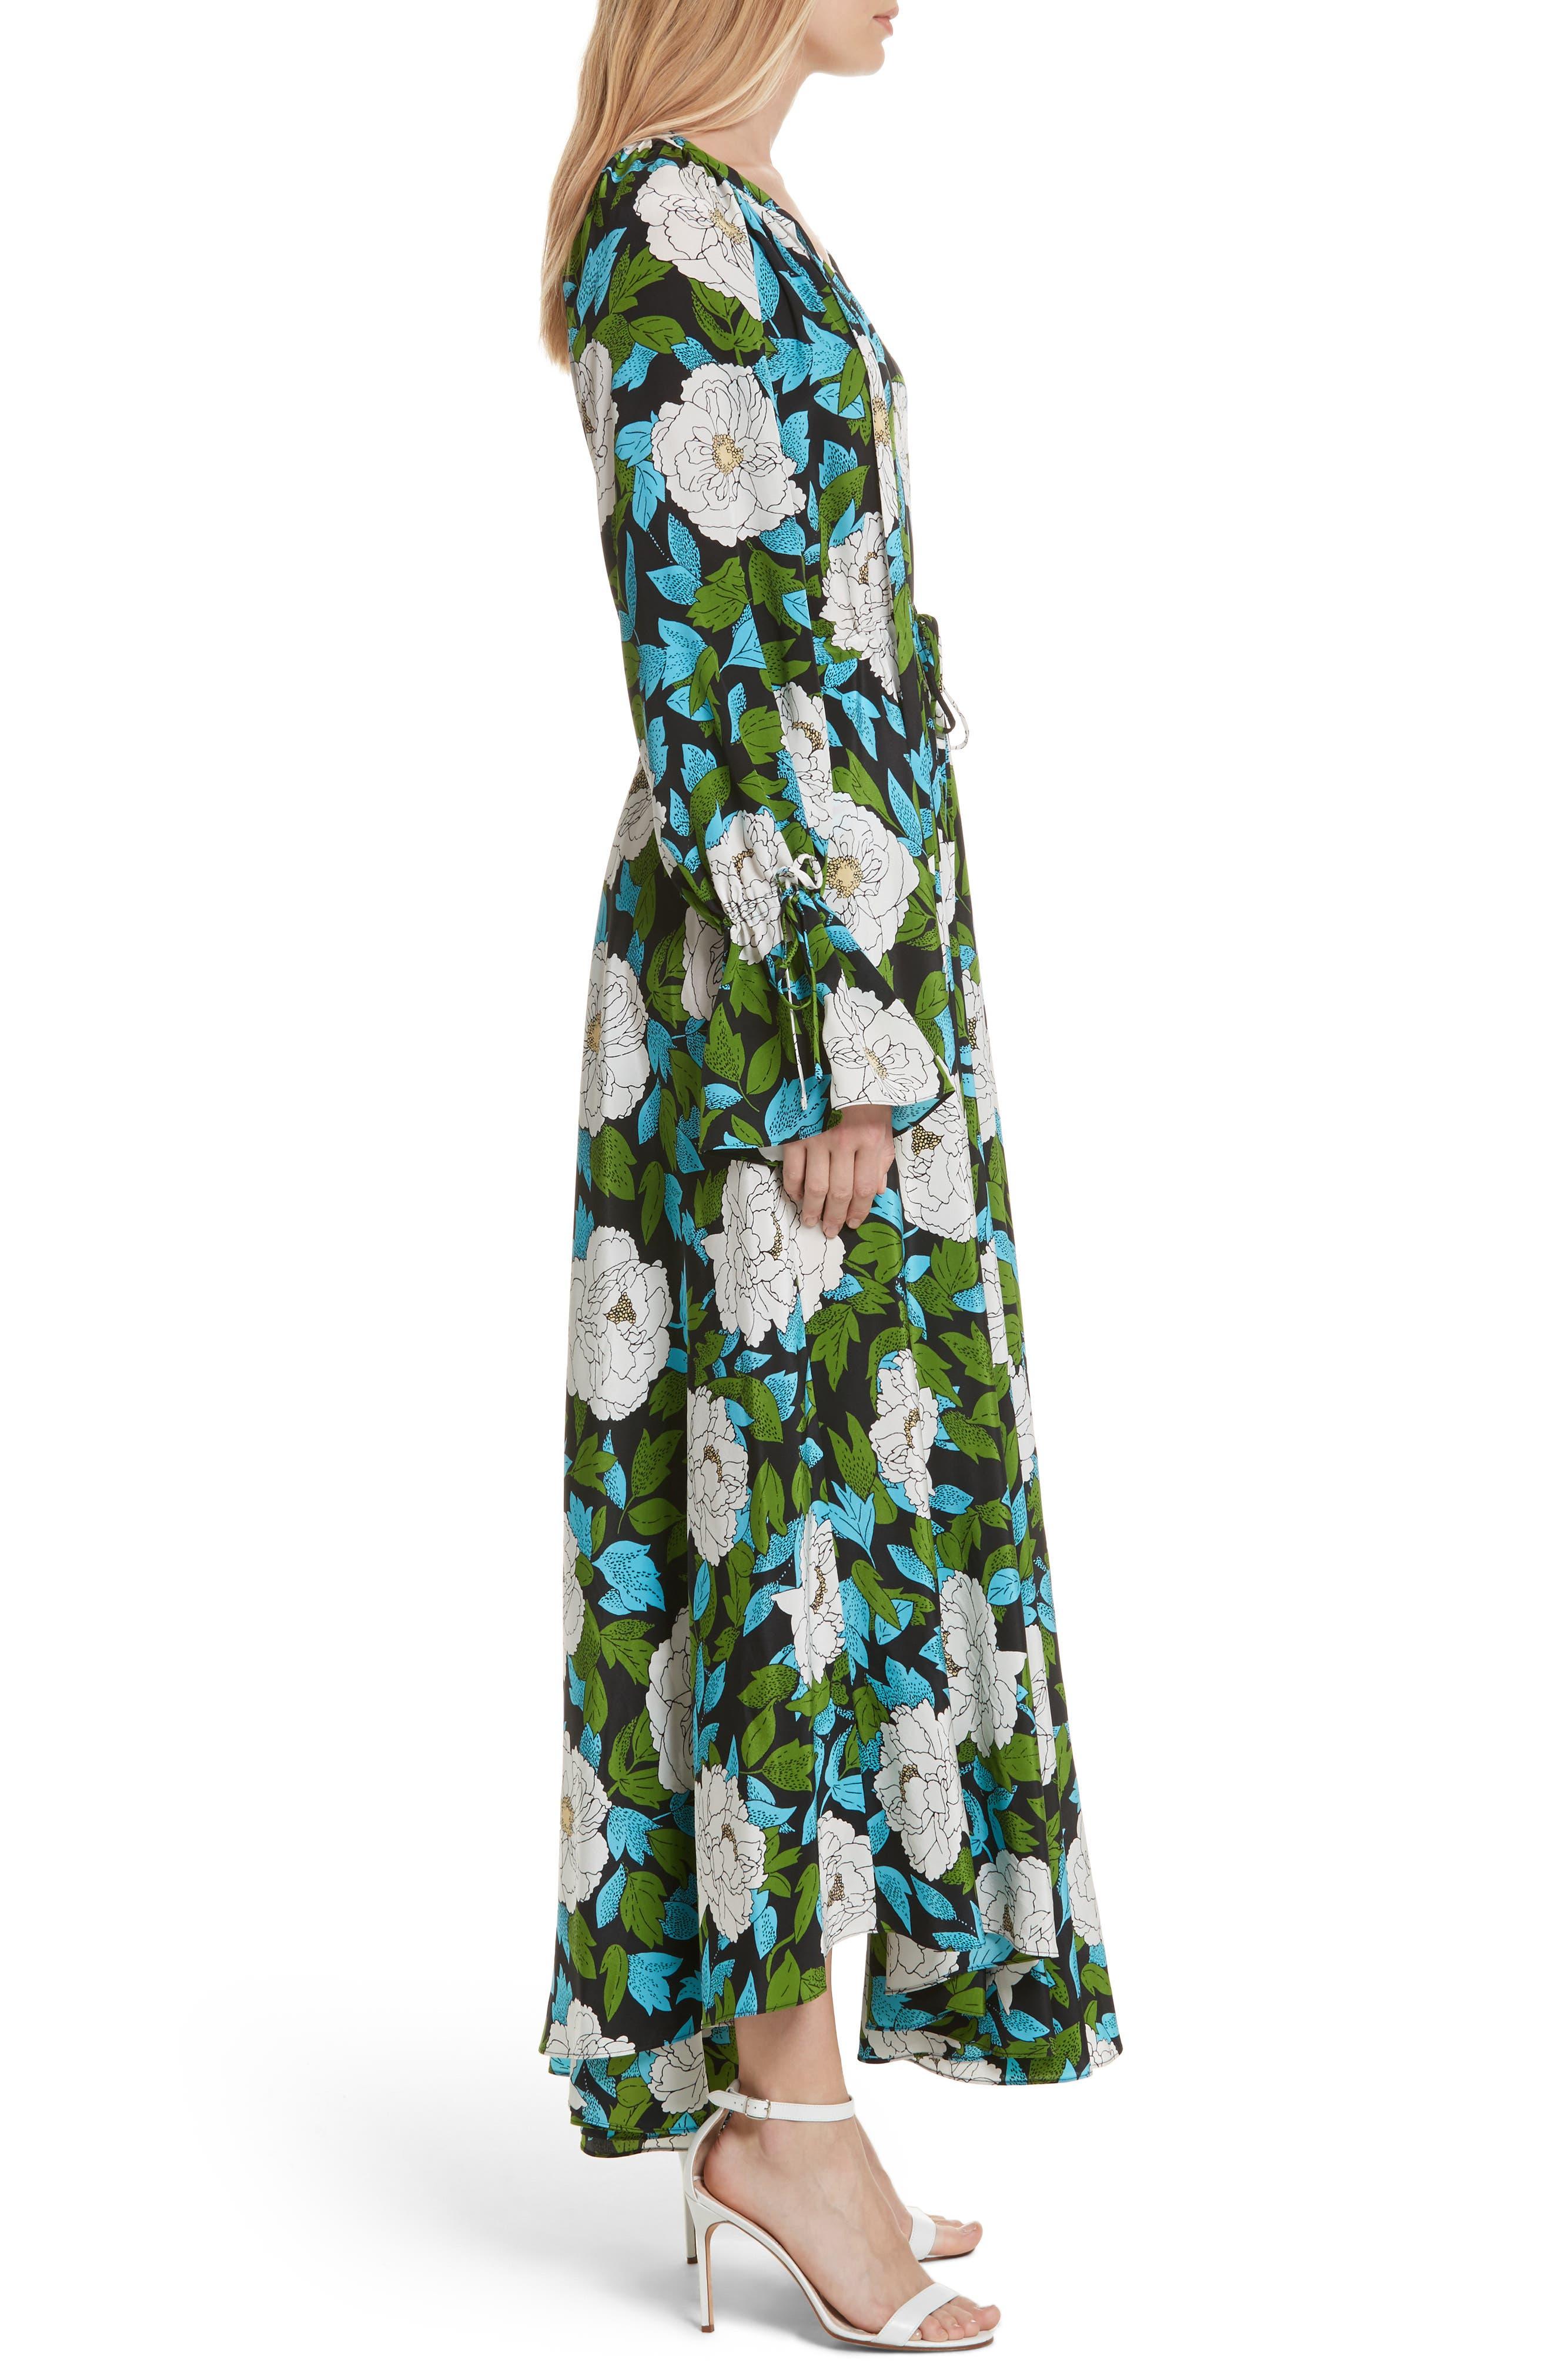 Diane von Furstenberg Floral Silk Maxi Dress,                             Alternate thumbnail 3, color,                             389